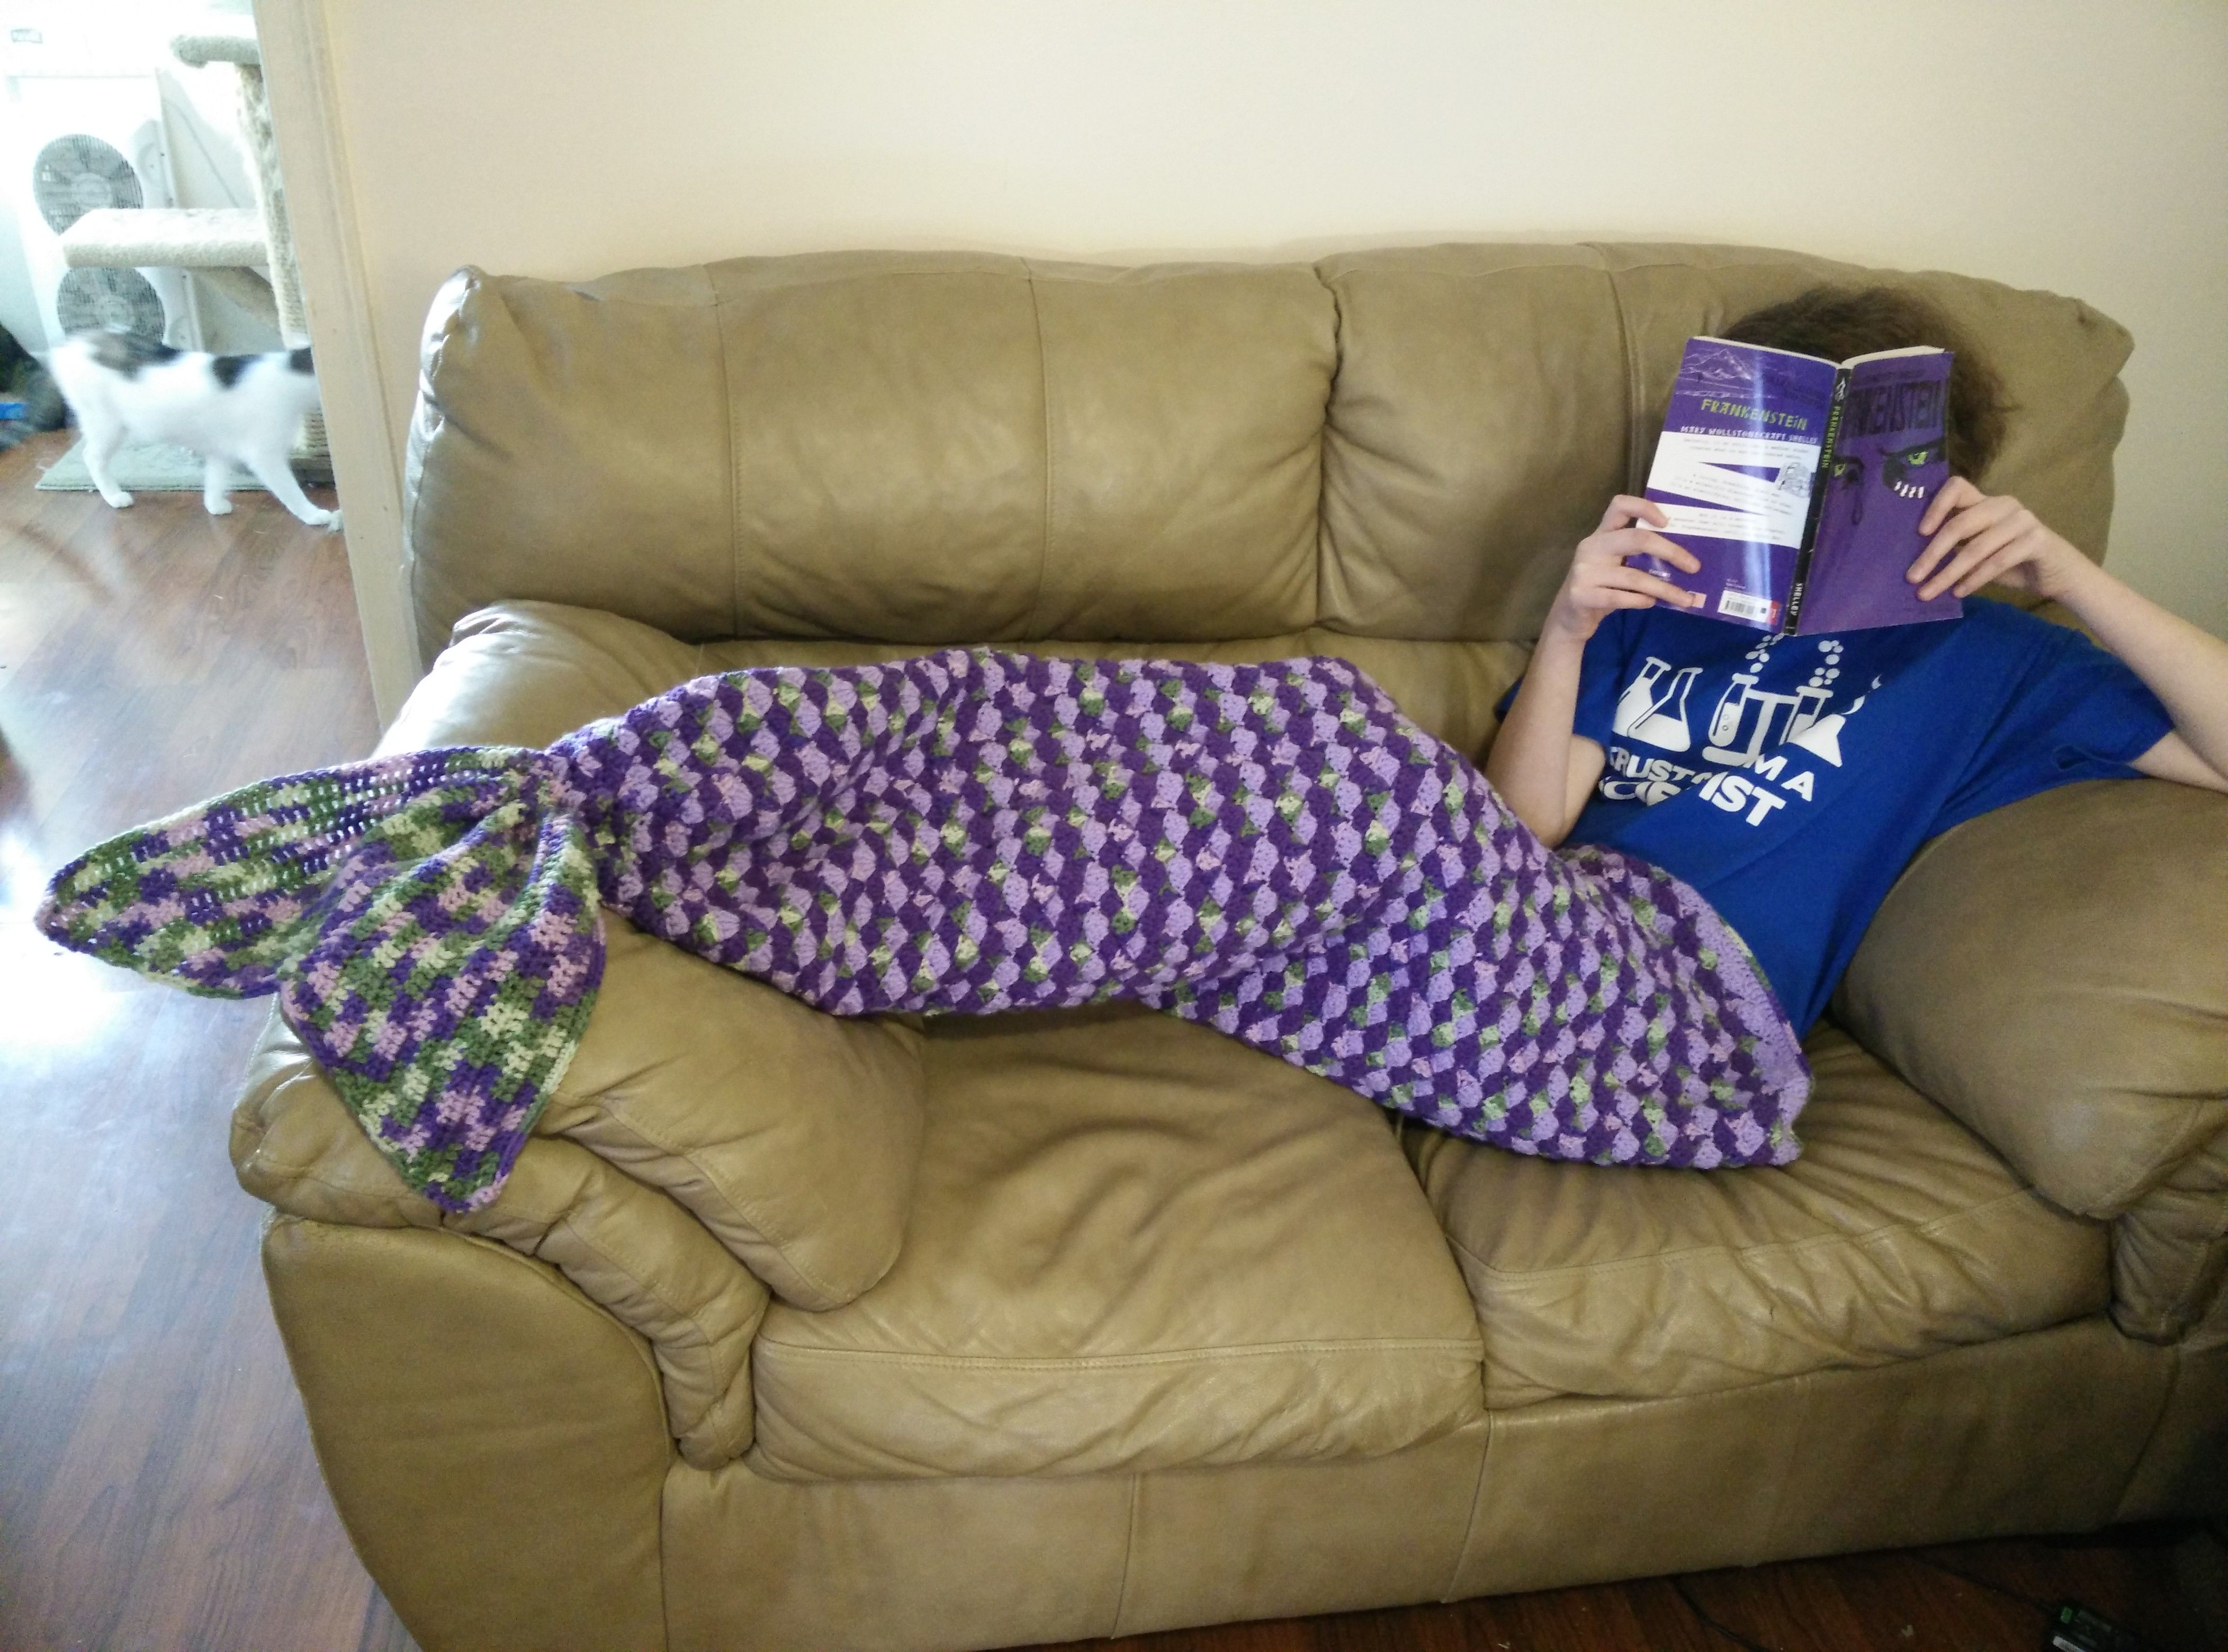 Adult size mermaid lap blanket | http://www.ravelry.com/patterns/library/adult-sized-mermaid-lapghan